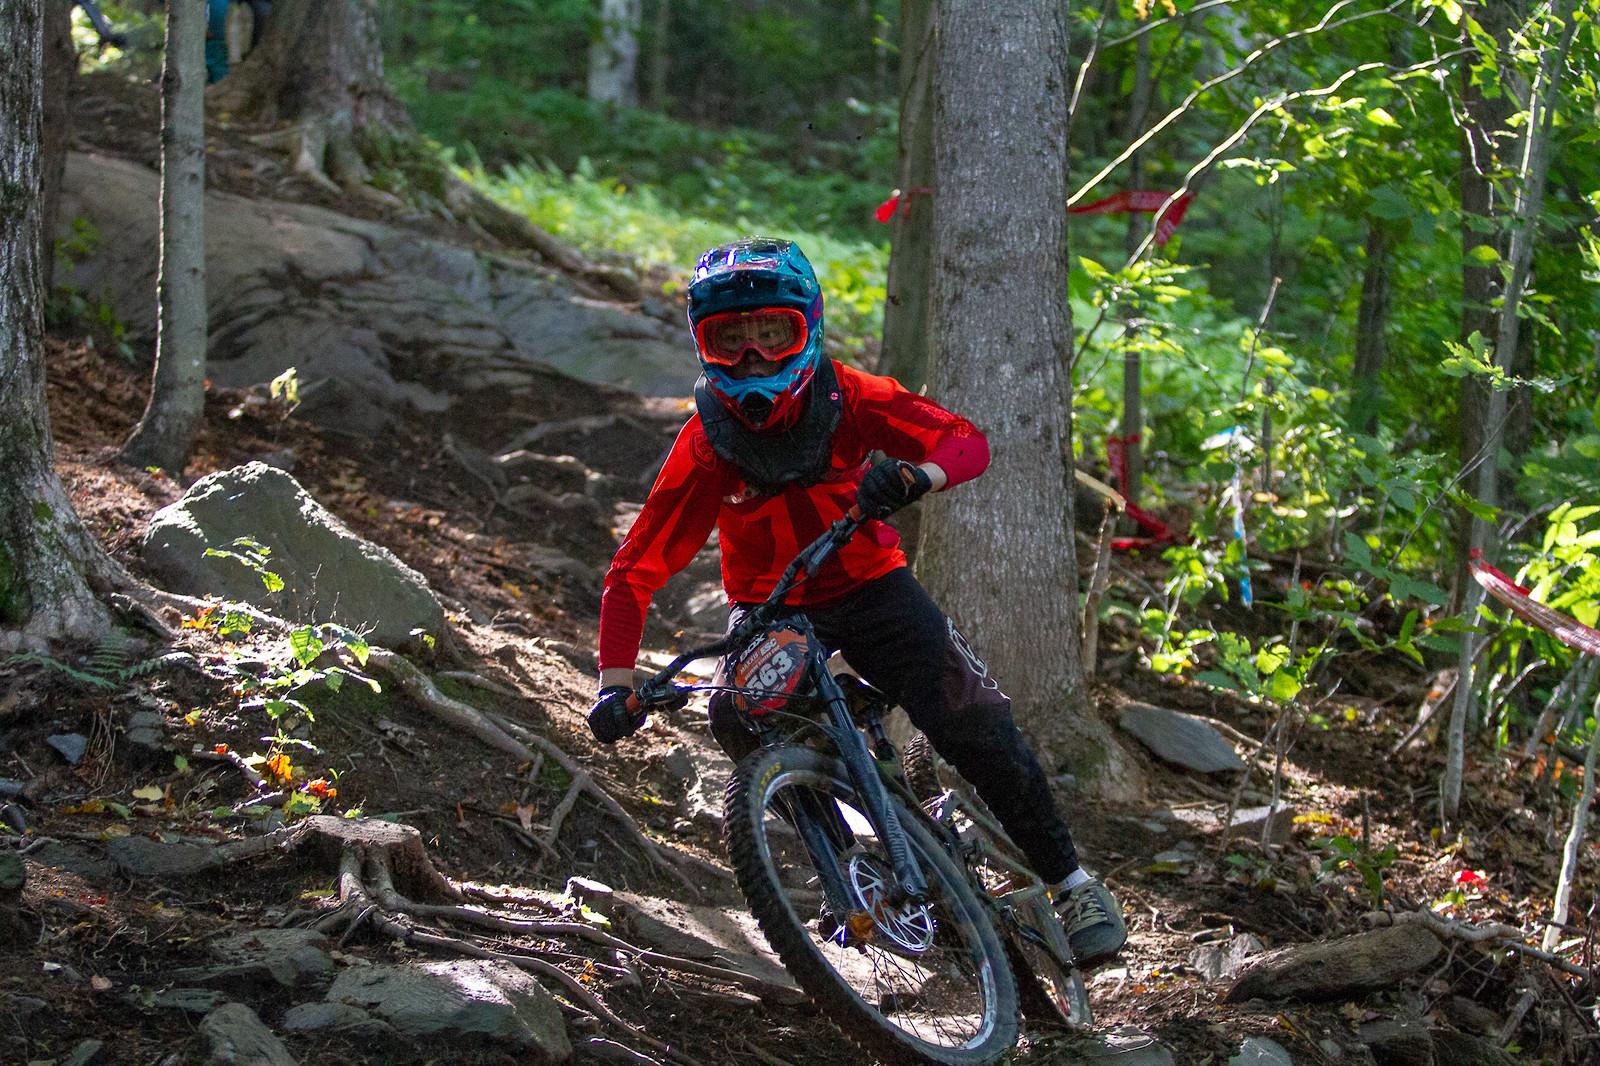 Alex Negersmith - JackRice - Mountain Biking Pictures - Vital MTB